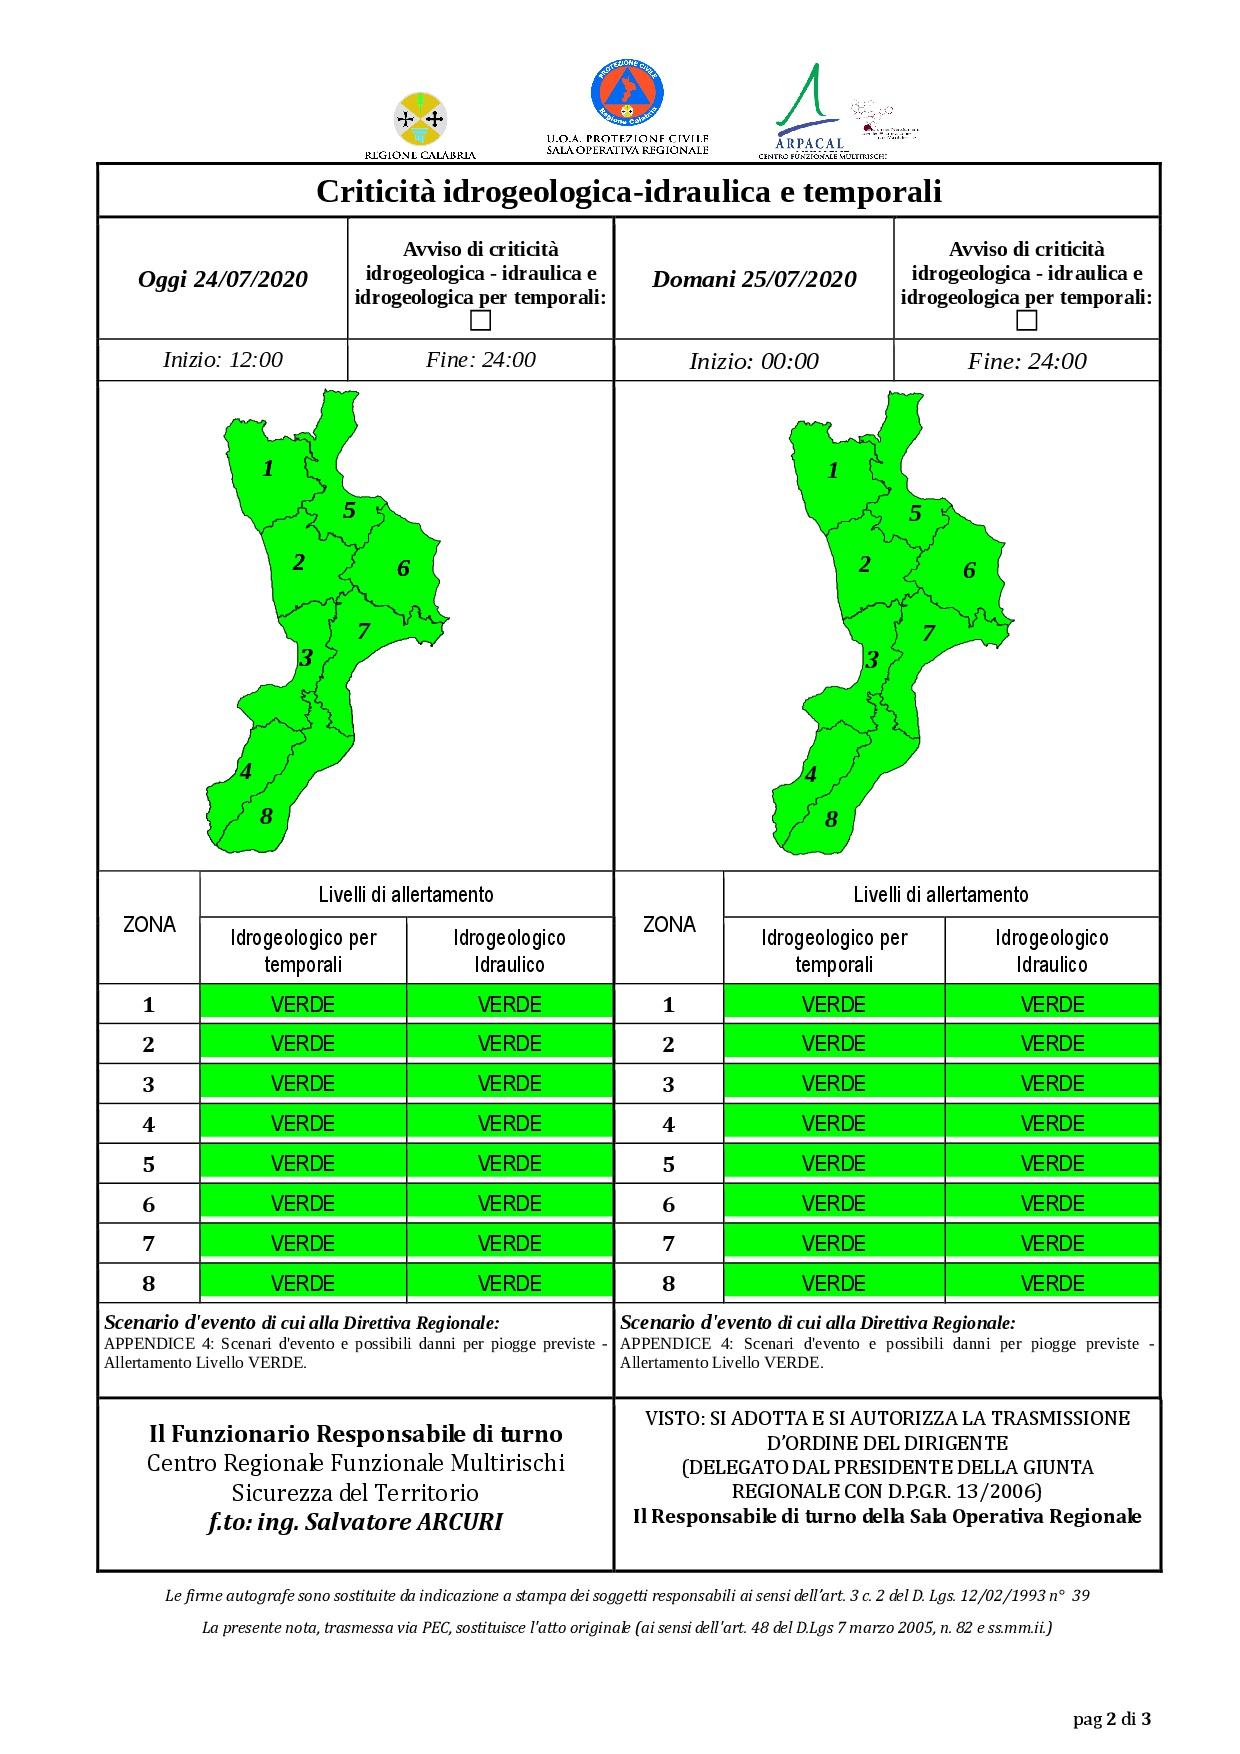 Criticità idrogeologica-idraulica e temporali in Calabria 24-07-2020